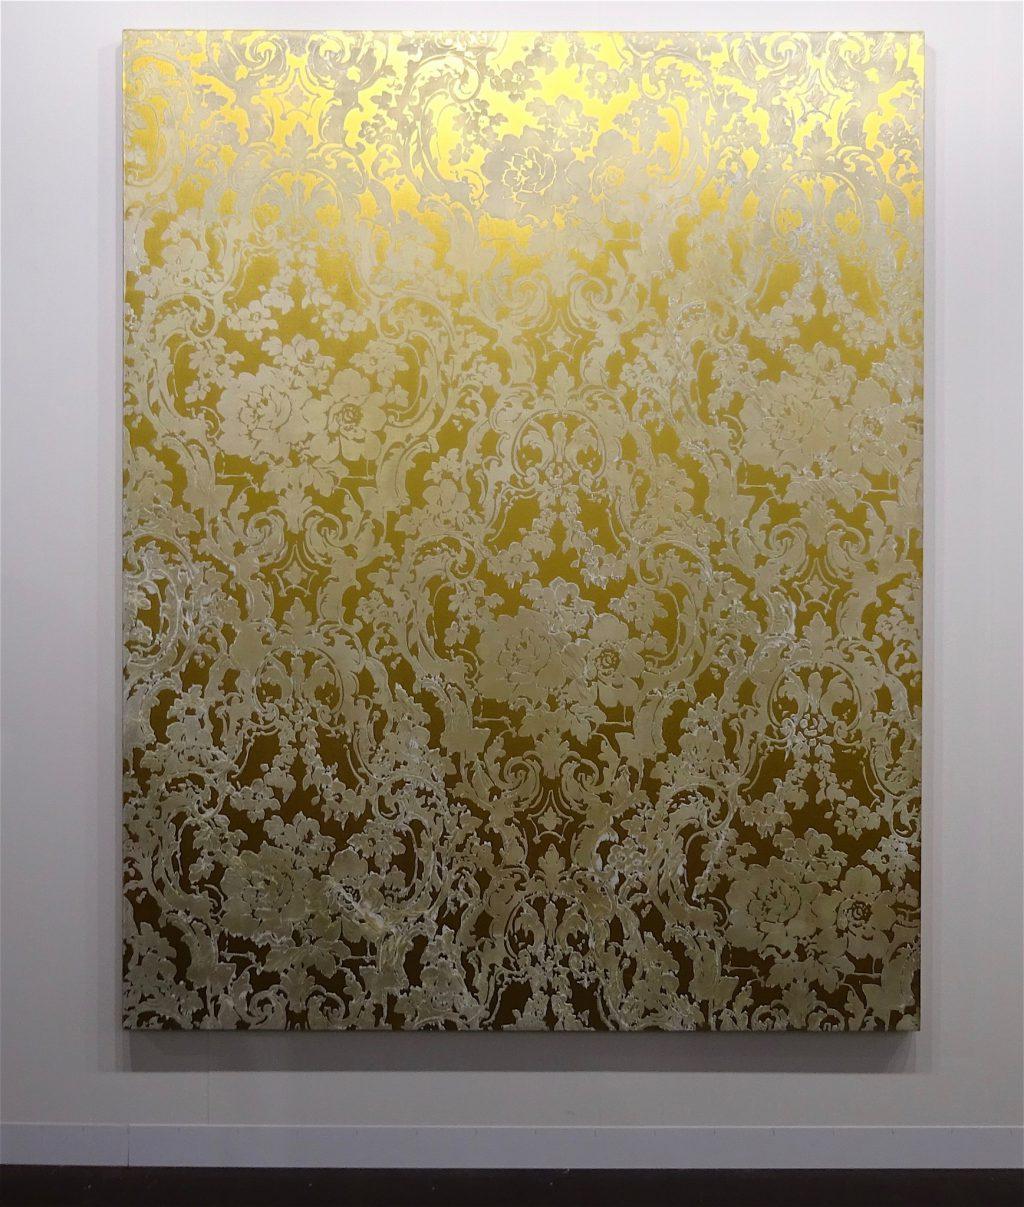 "Rudolf Stingel ""Untitled"" 2007, Oil and enamel on canvas, 242 x 193 cm WHITE CUBE"